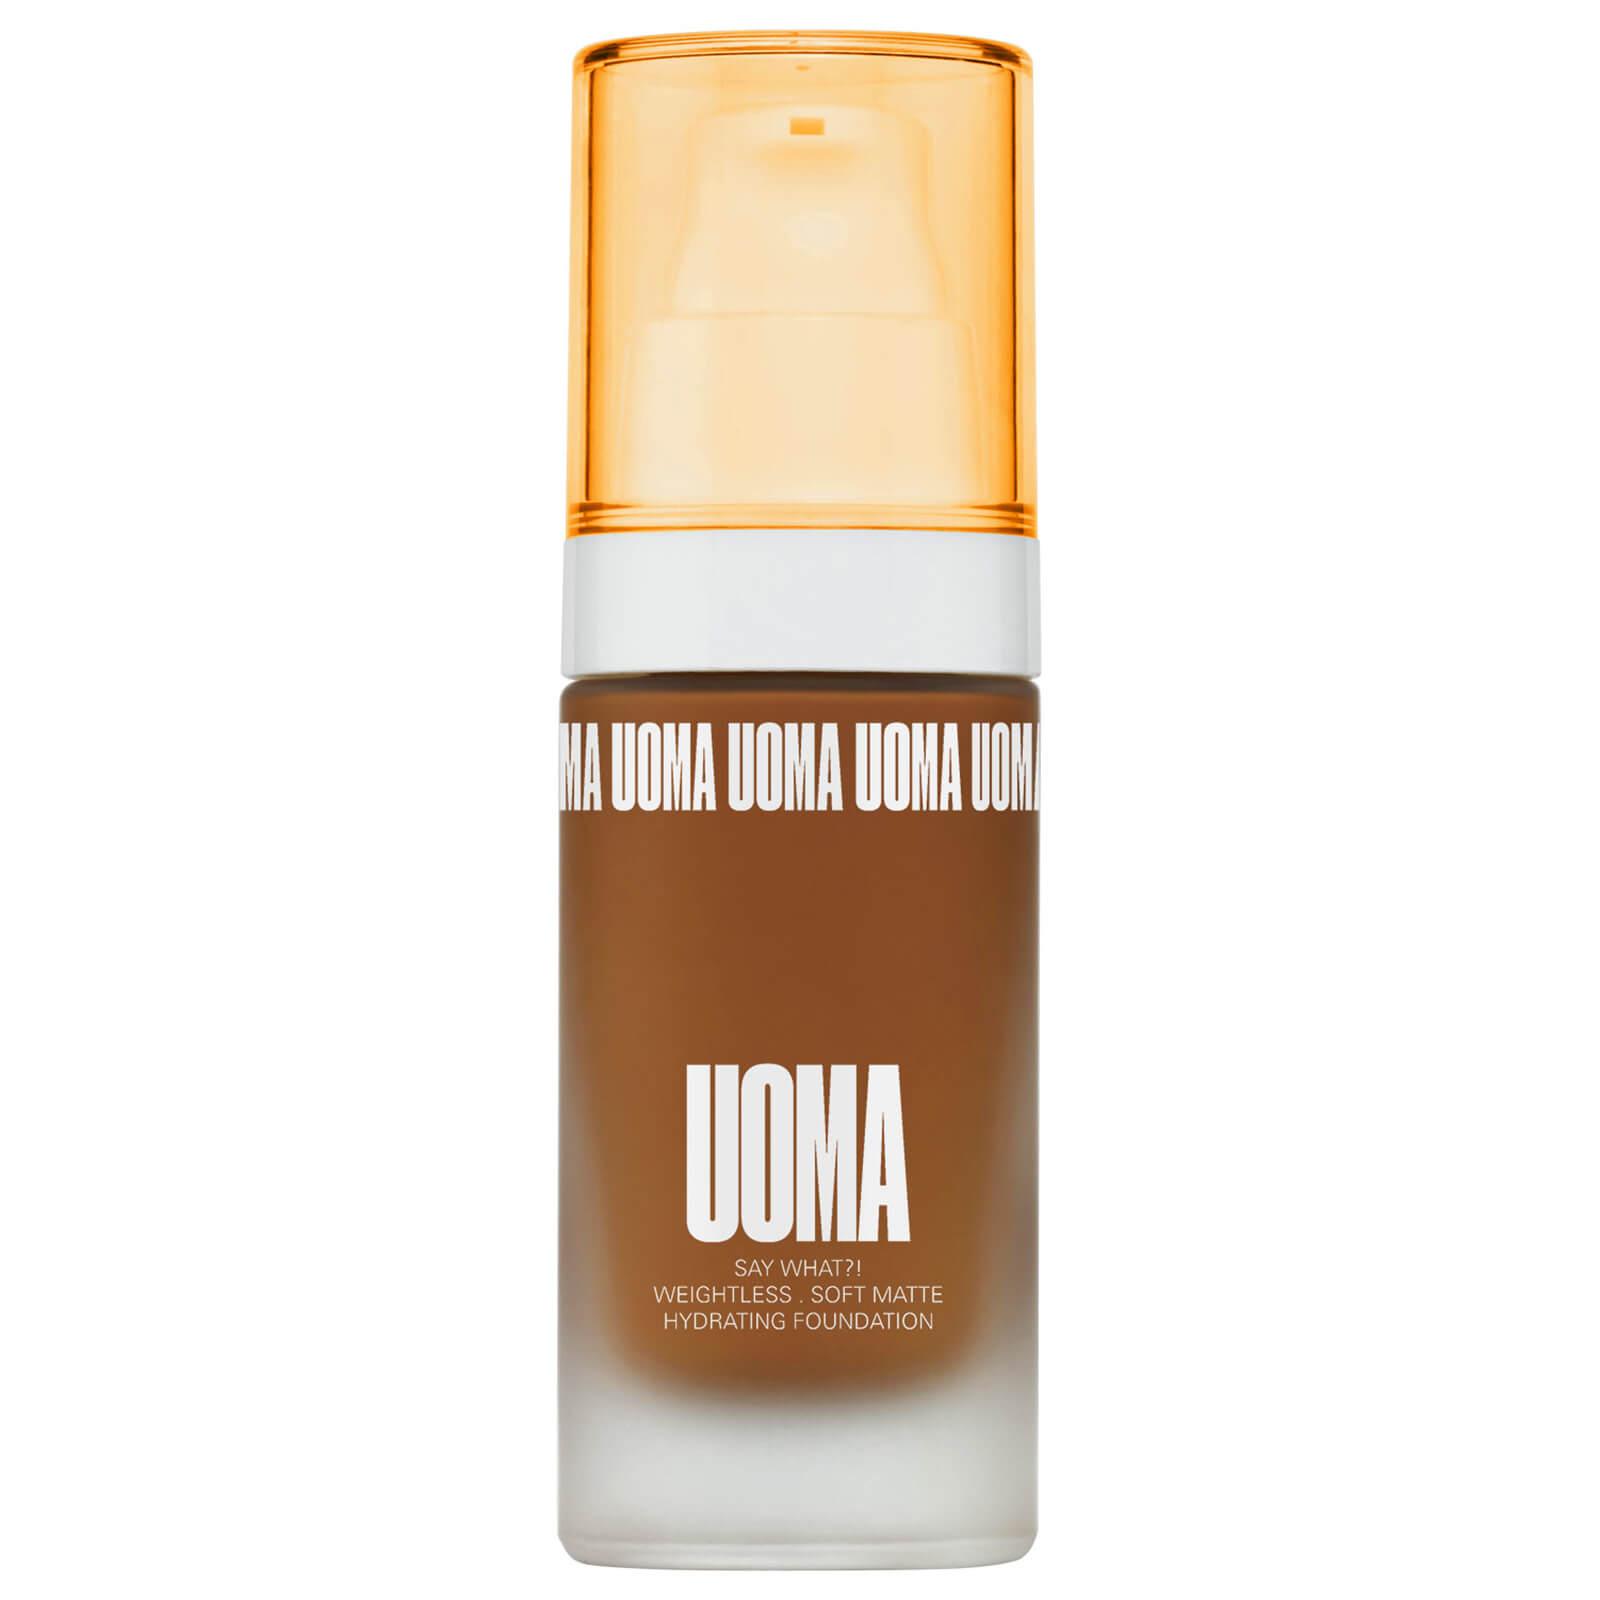 Купить UOMA Beauty Say What Foundation 30ml (Various Shades) - Brown Sugar T4N